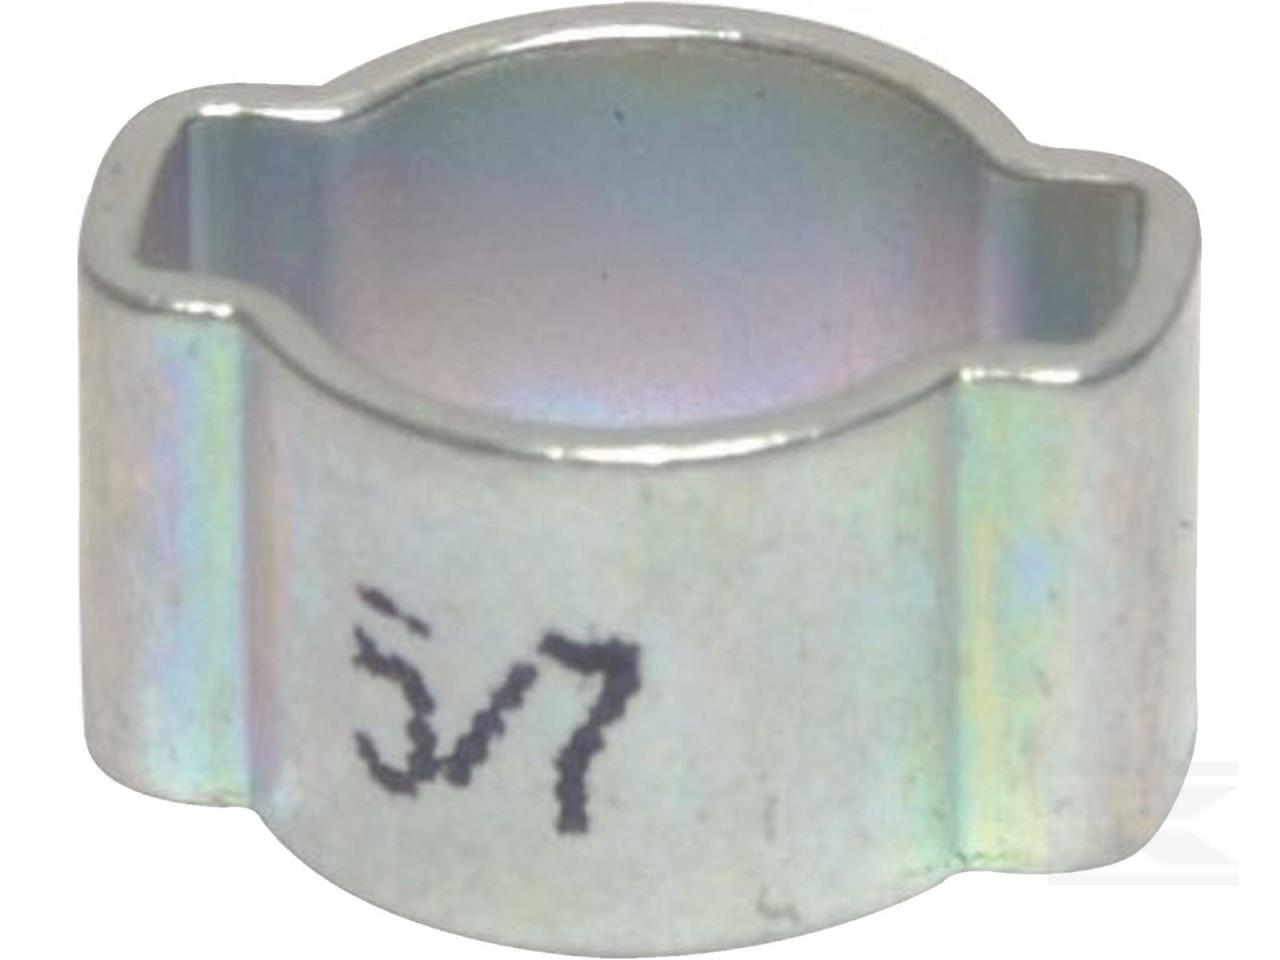 Øreclamp, ABA, 9-11 mm